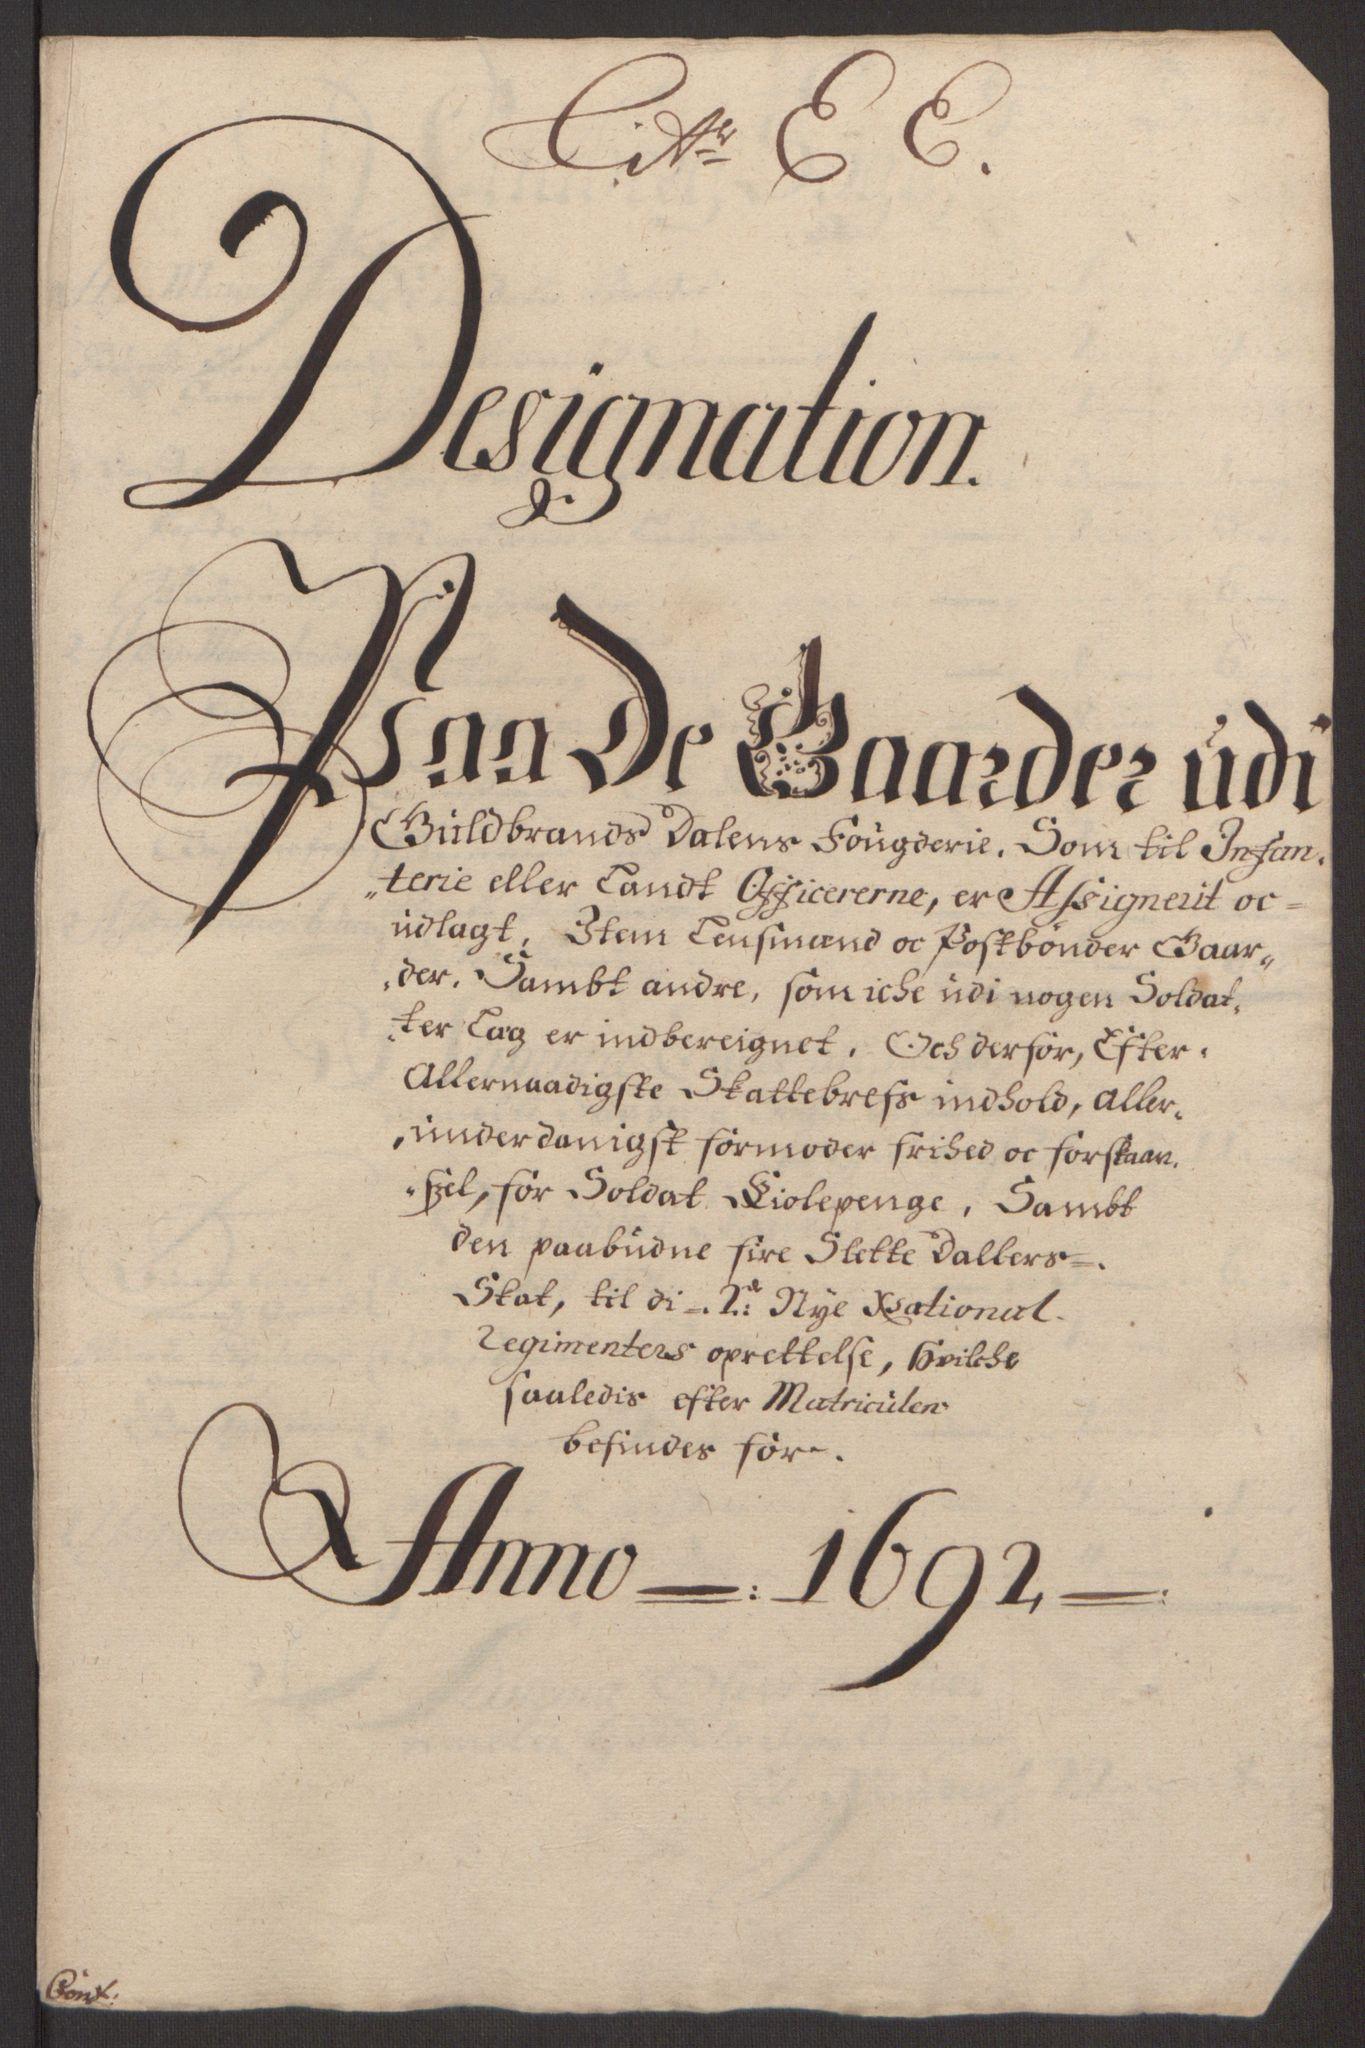 RA, Rentekammeret inntil 1814, Reviderte regnskaper, Fogderegnskap, R17/L1166: Fogderegnskap Gudbrandsdal, 1690-1692, s. 97